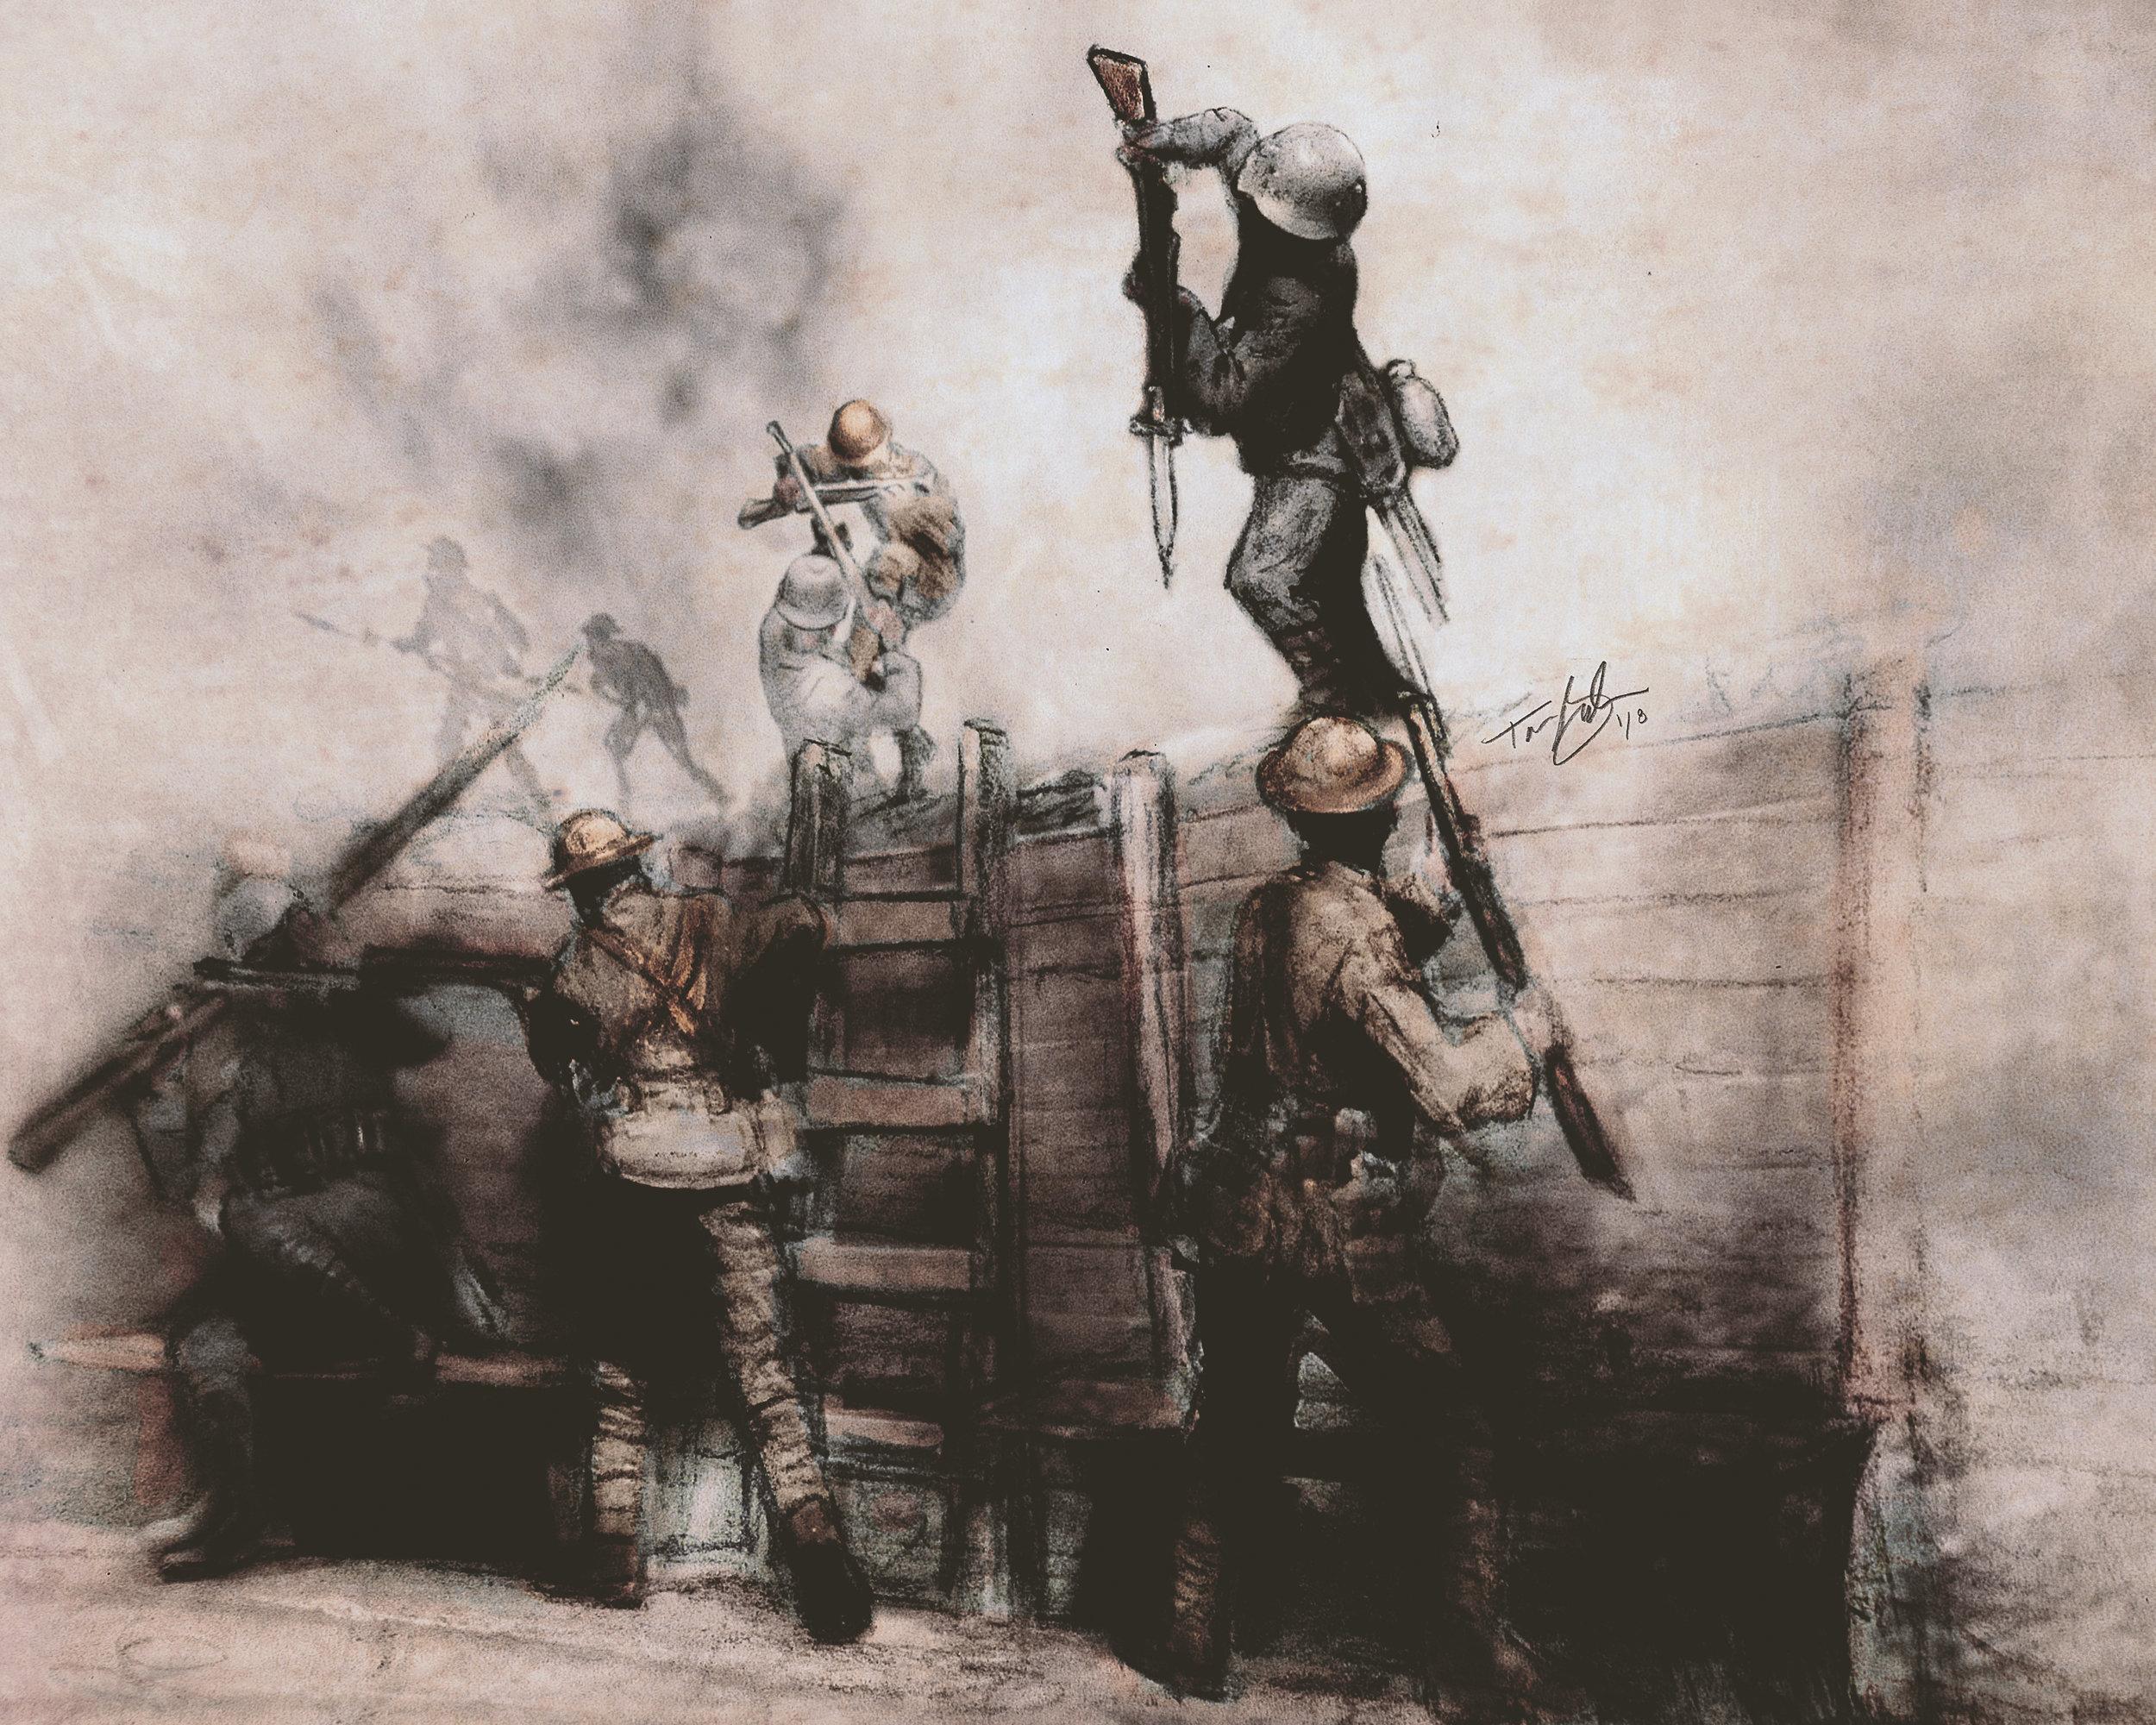 WW1_Champagne-Marne_noText.jpg